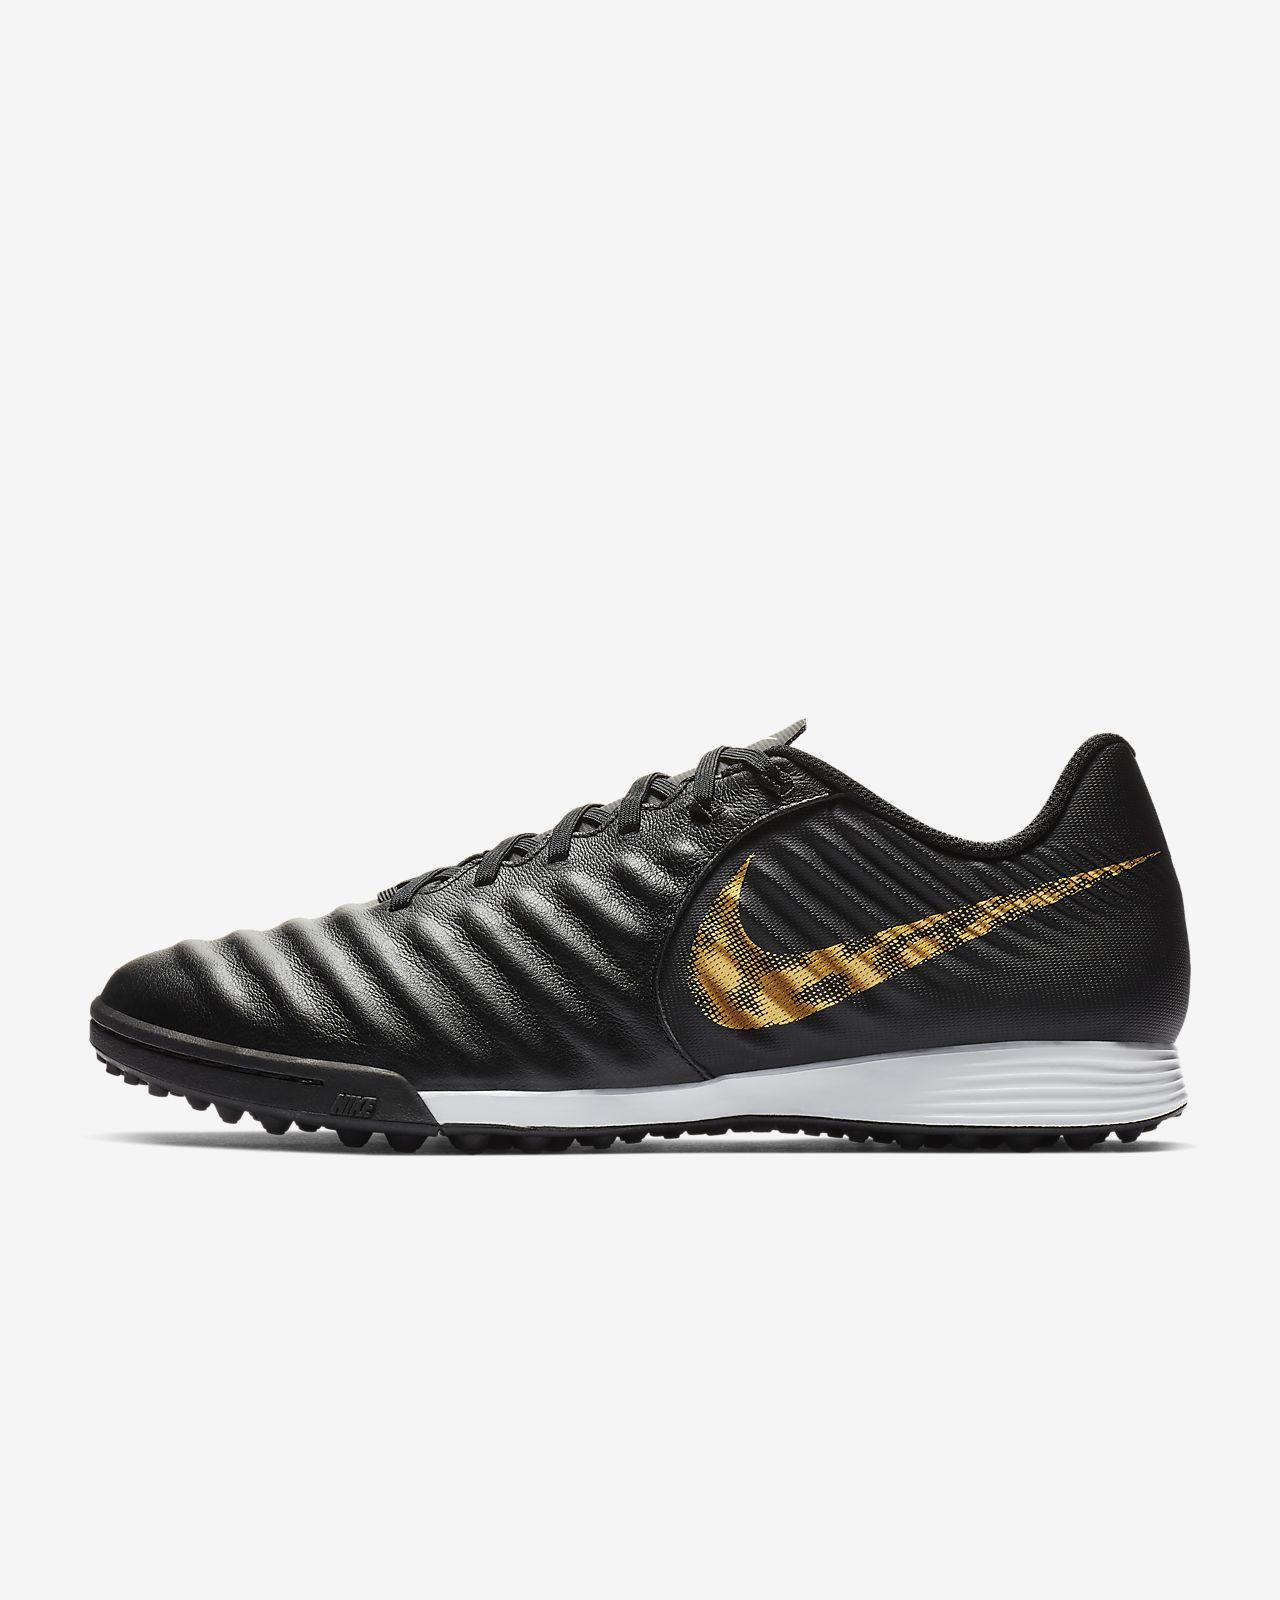 Nike LegendX 7 Academy TF Botas de fútbol para hierba artificial o moqueta  - Turf 46cf7156bec75